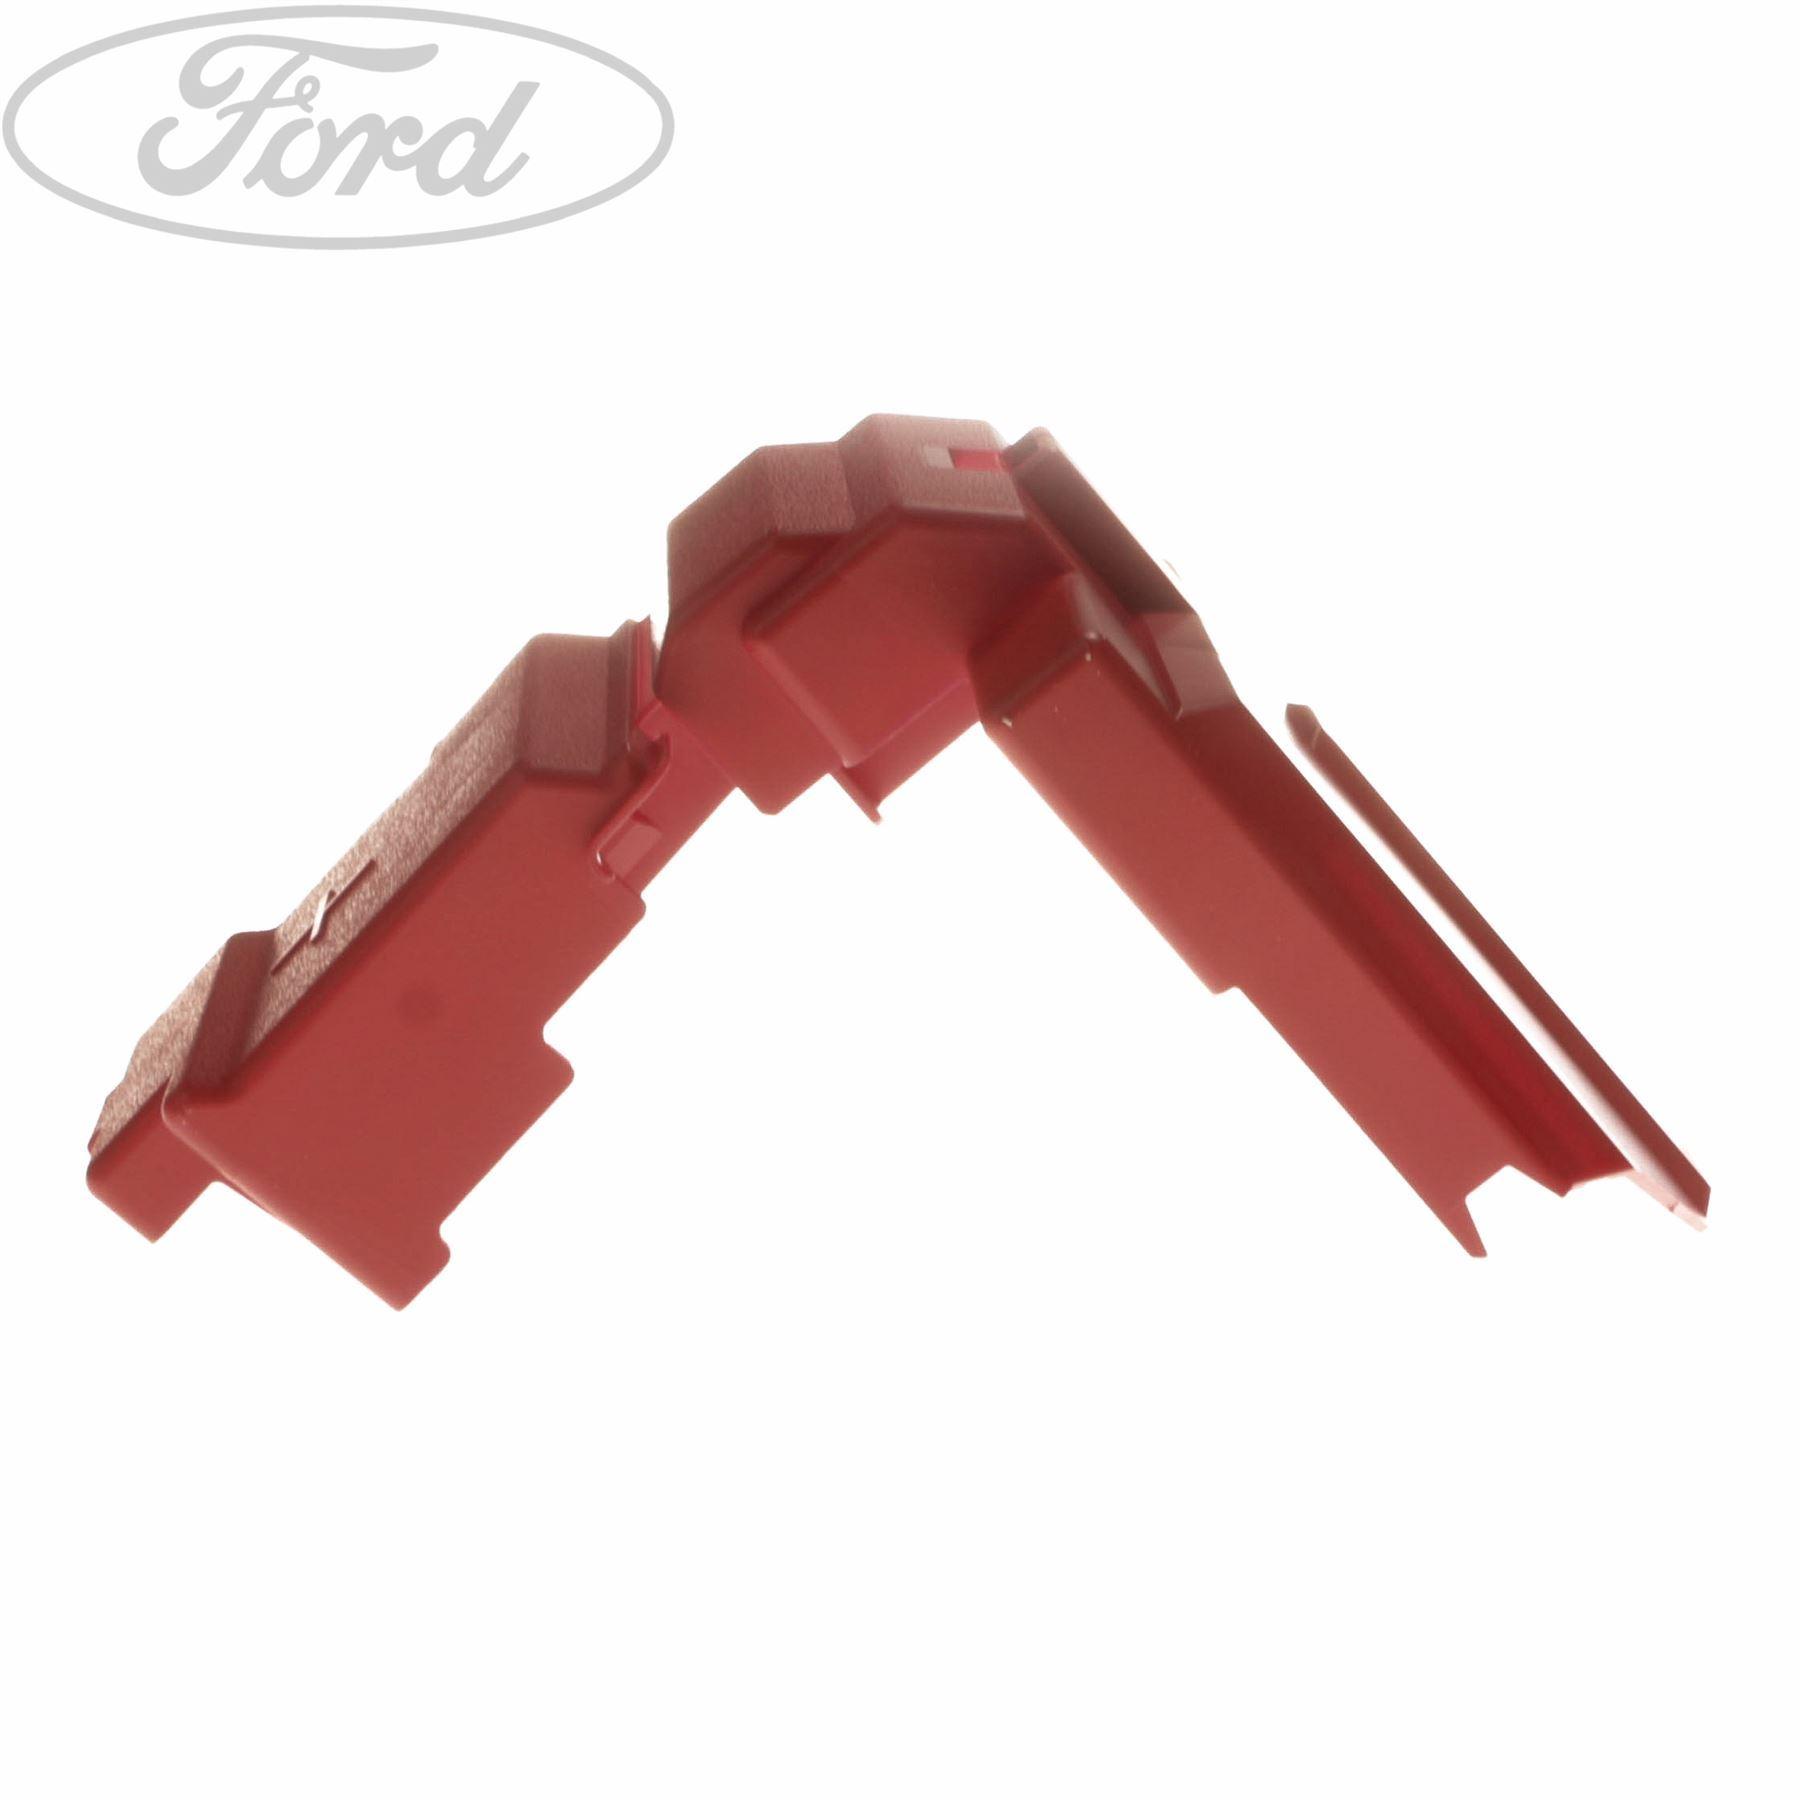 Genuine Ford Fiesta Mk7 Fuse Box Cover 1832217 Ebay On 2006